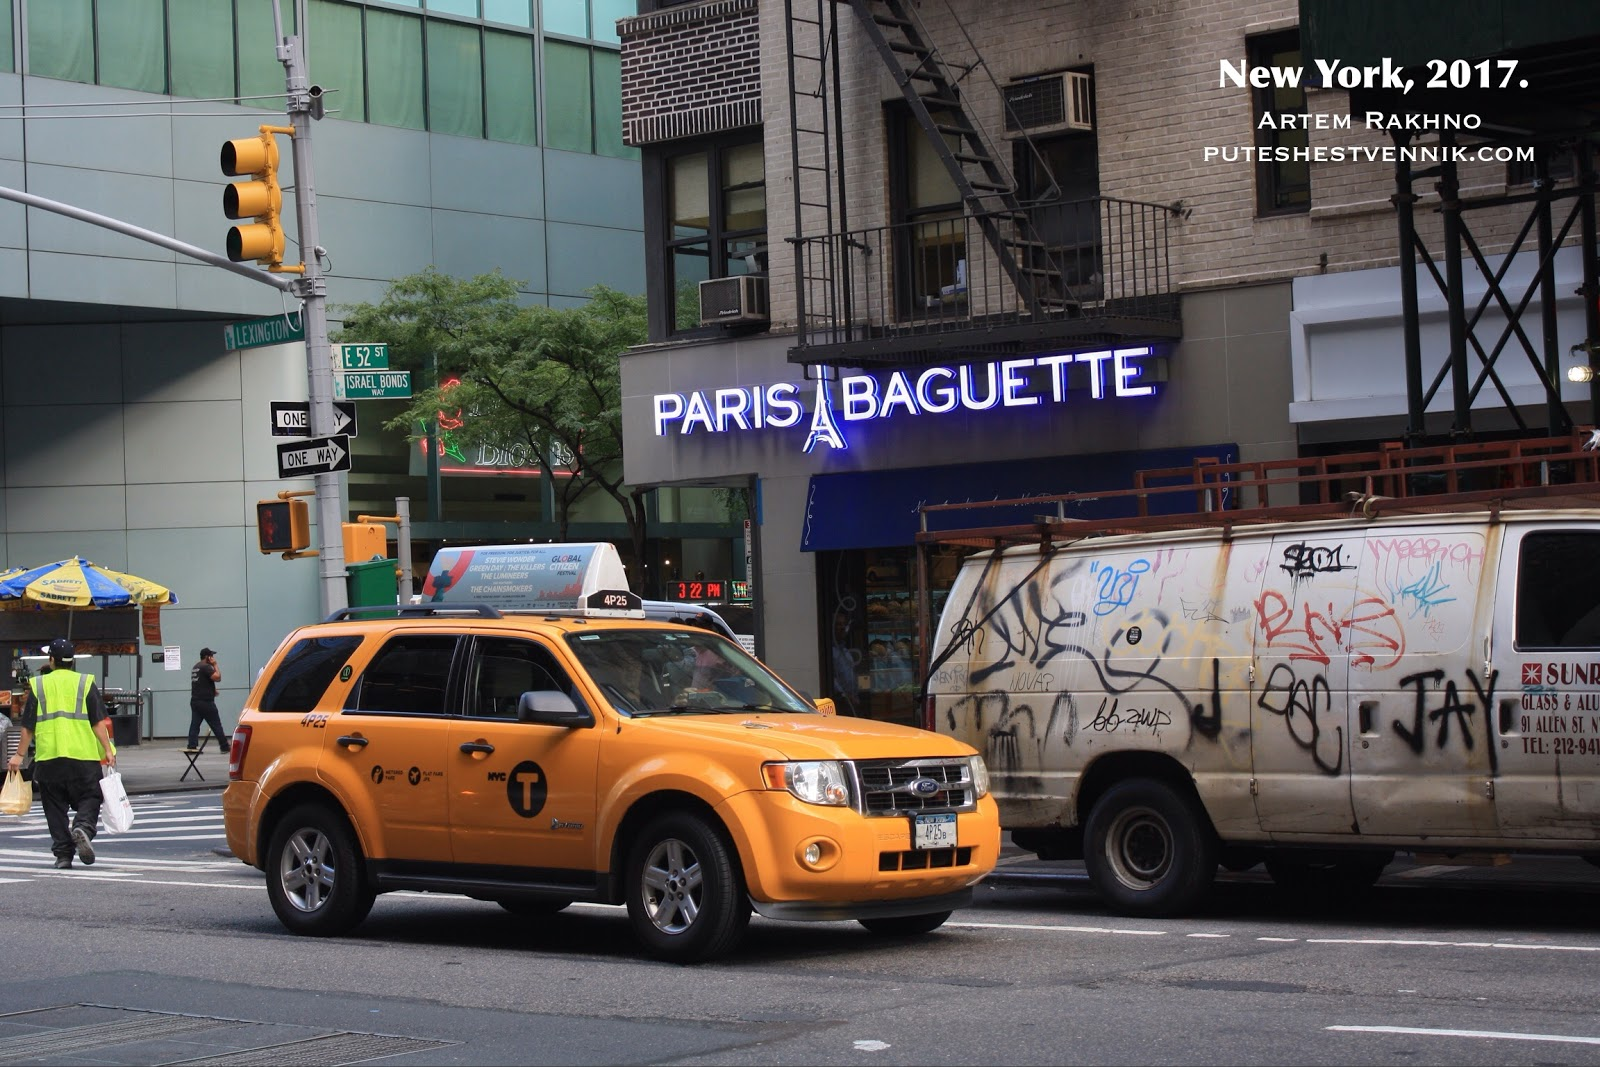 Французская булочная в Нью-Йорке